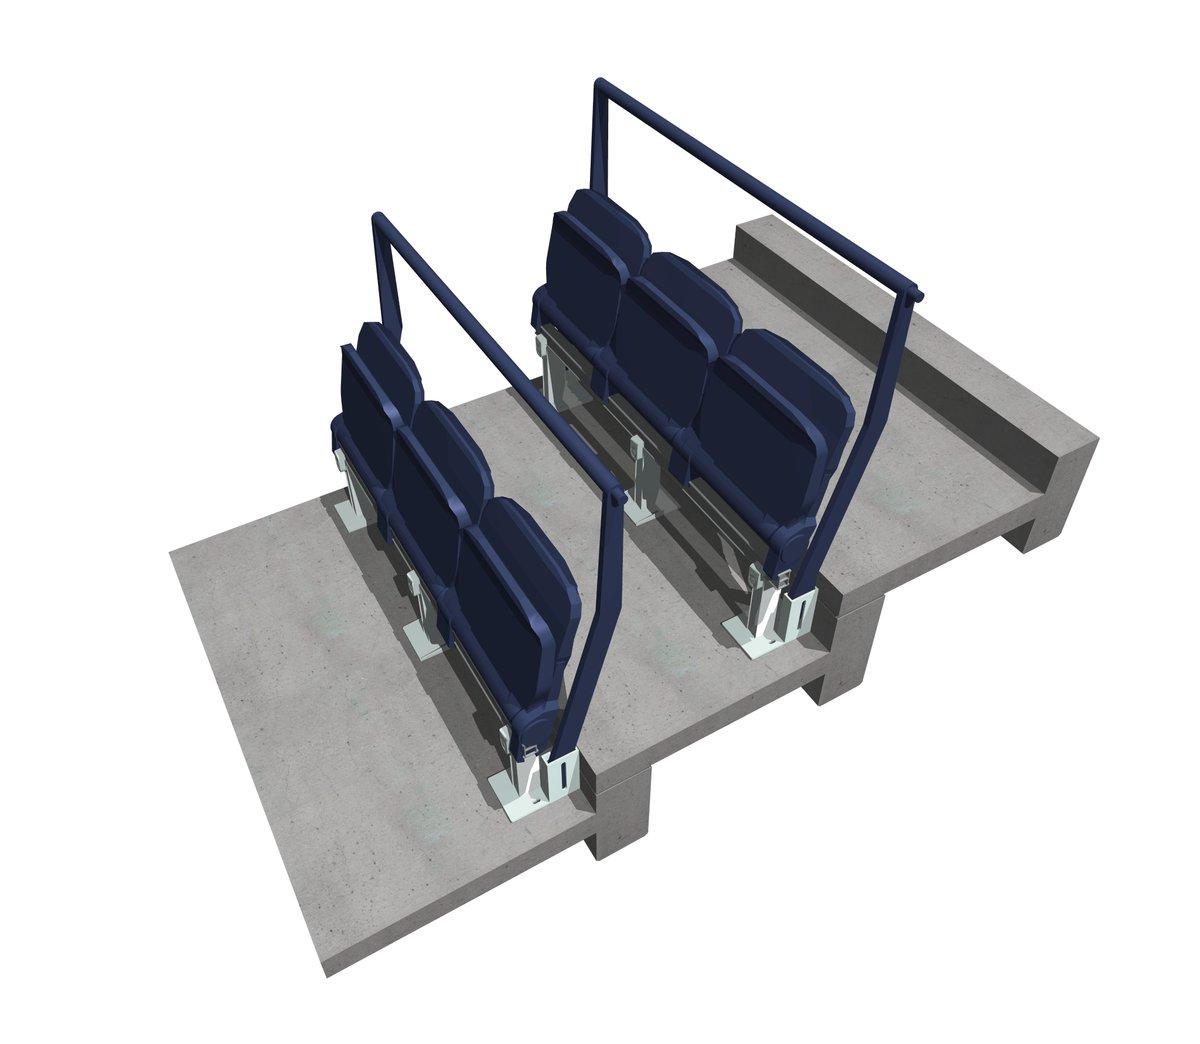 nuovo stadio tottenham posti safe standing